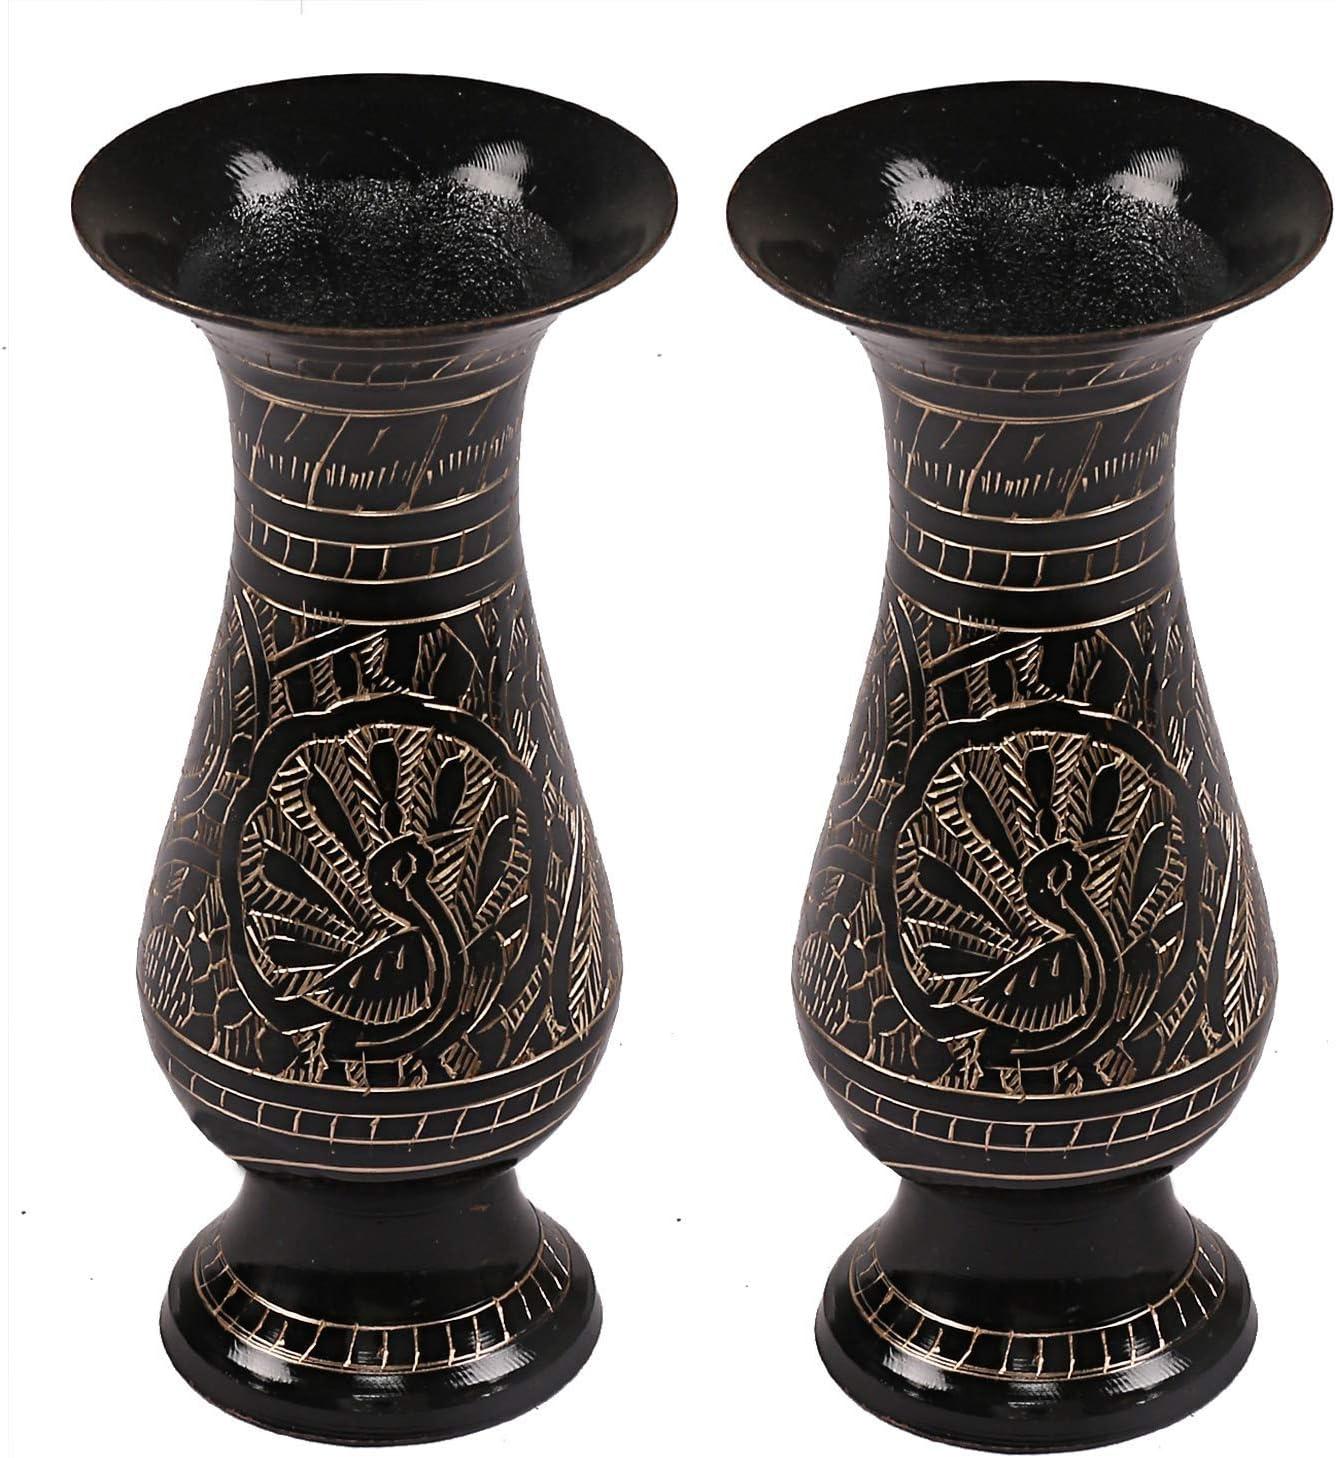 PARIJAT HANDICRAFT Brass Flower Vase | Pot Antique Handcrafted Peacock Showpiece Beautiful Home Office Decor Article (2)